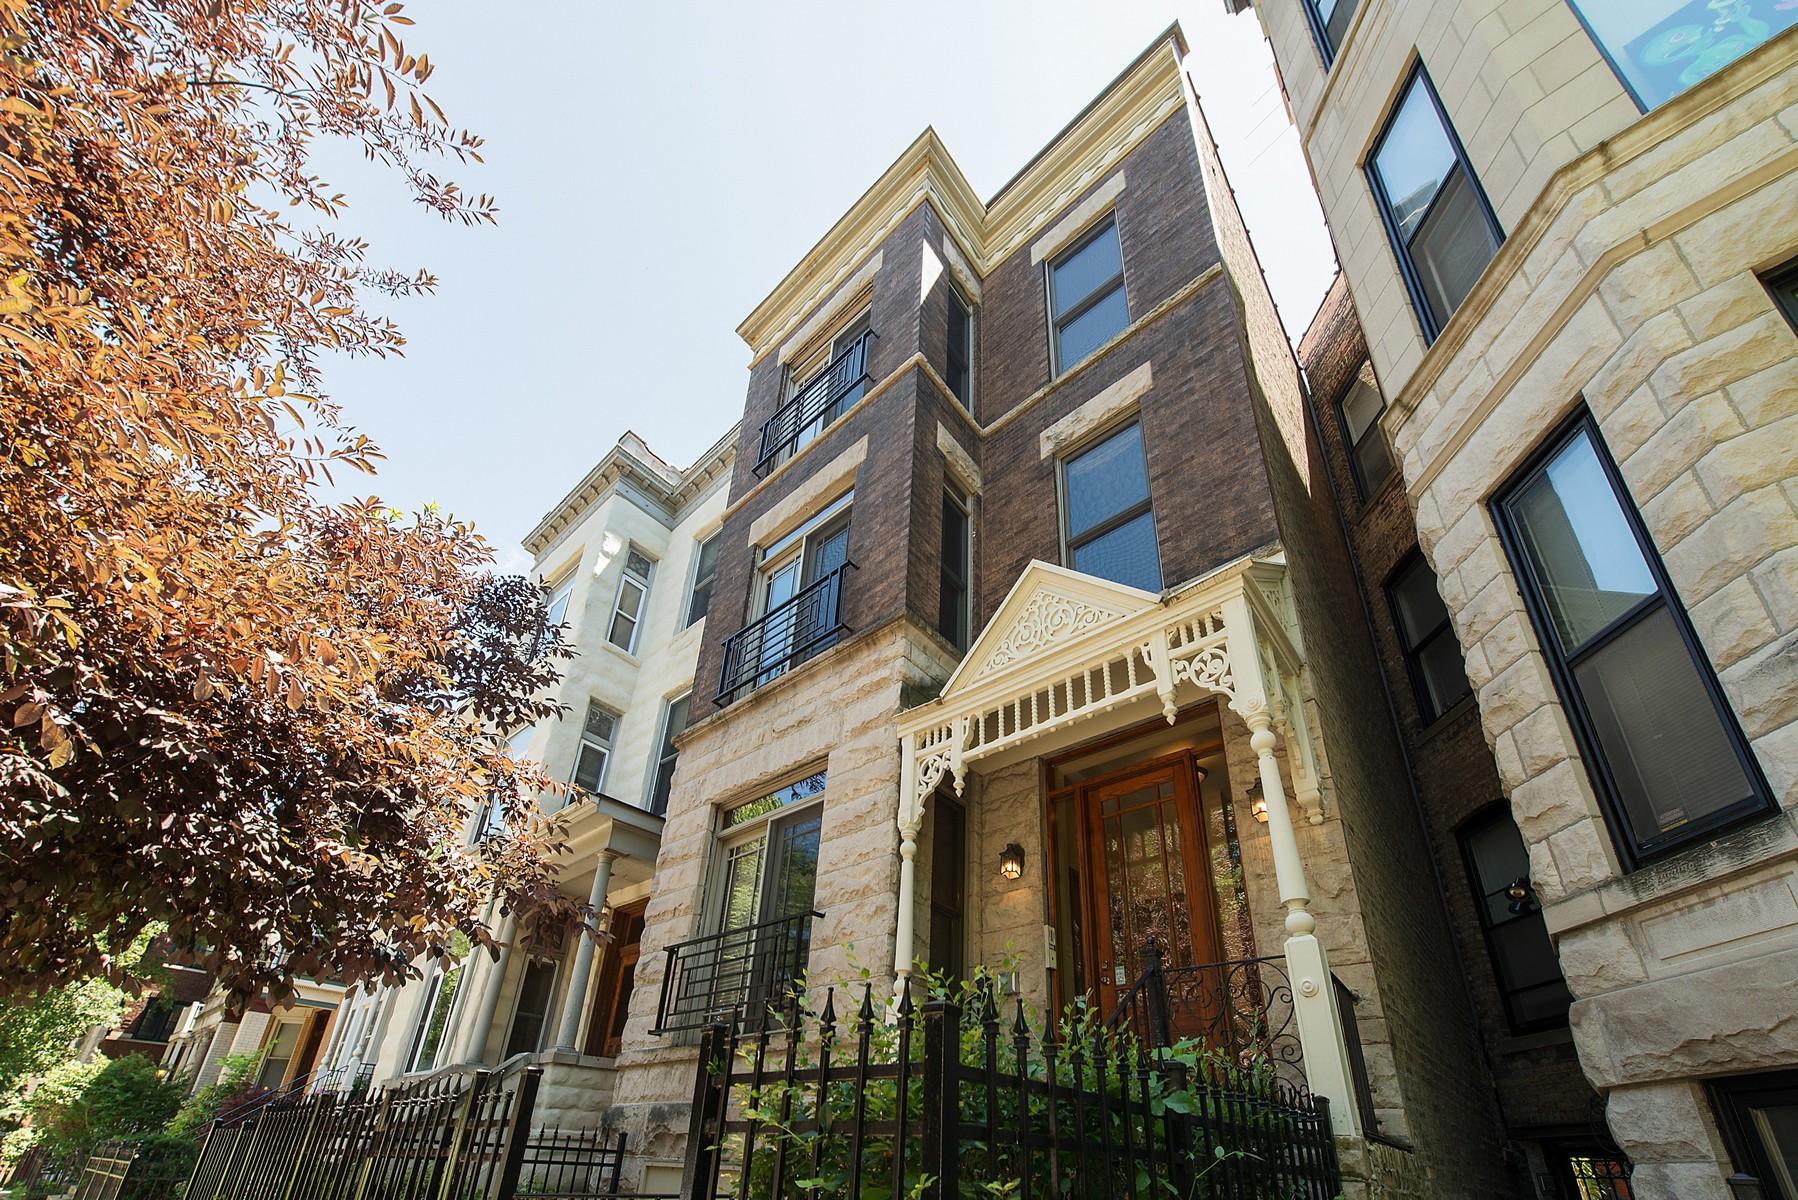 独户住宅 为 销售 在 Penthouse Home with Soaring Ceilings 859 W Newport Avenue Unit 3 Lakeview, 芝加哥, 伊利诺斯州, 60657 美国